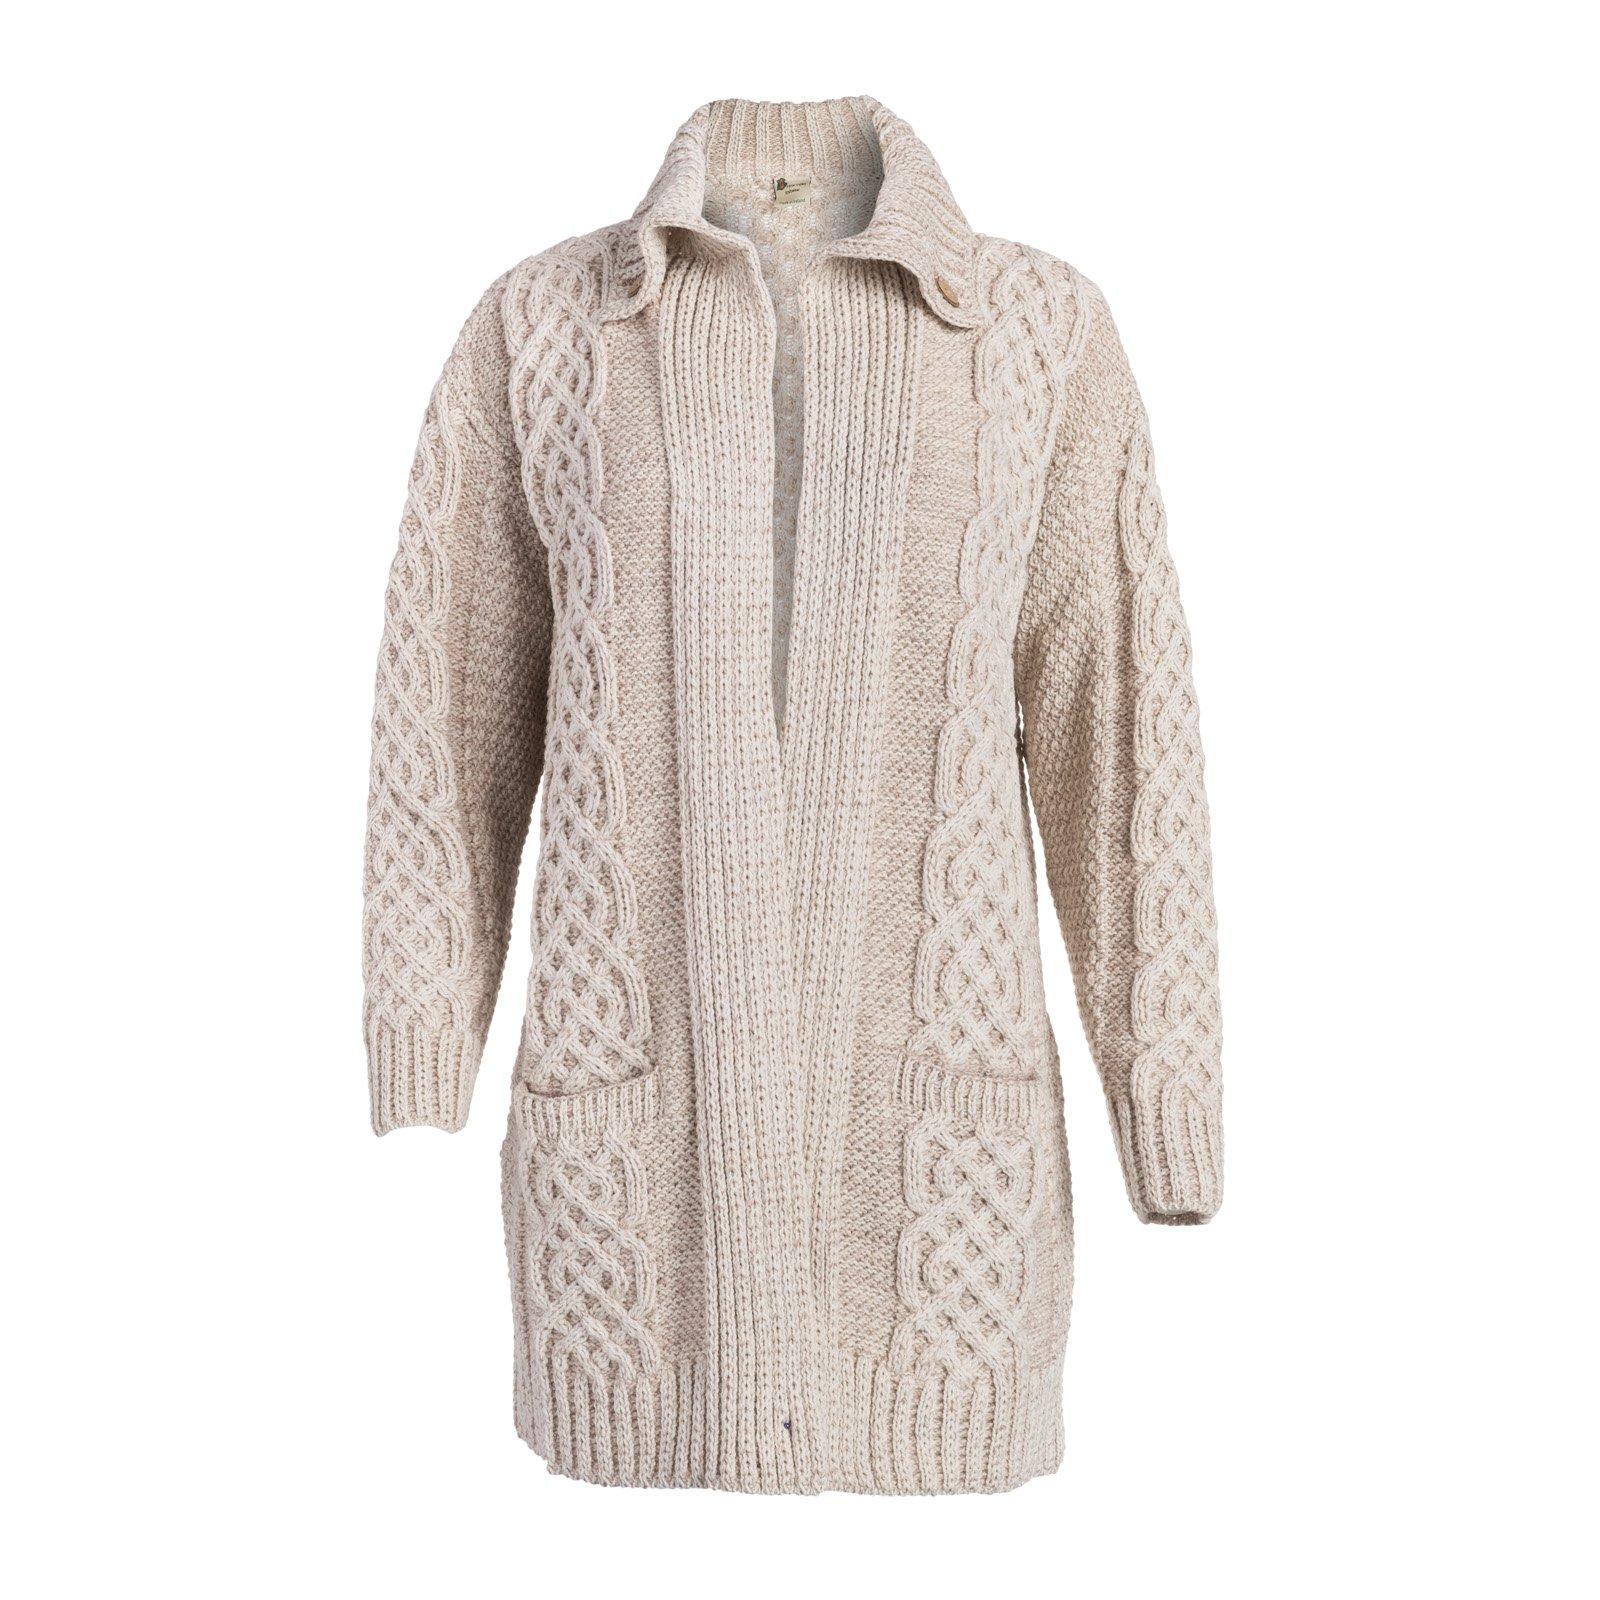 Boyne Valley Knitwear Ladies Celtic Fall Wool Cable Coat Cardigan (Medium, White/Wicker) by Boyne Valley Knitwear